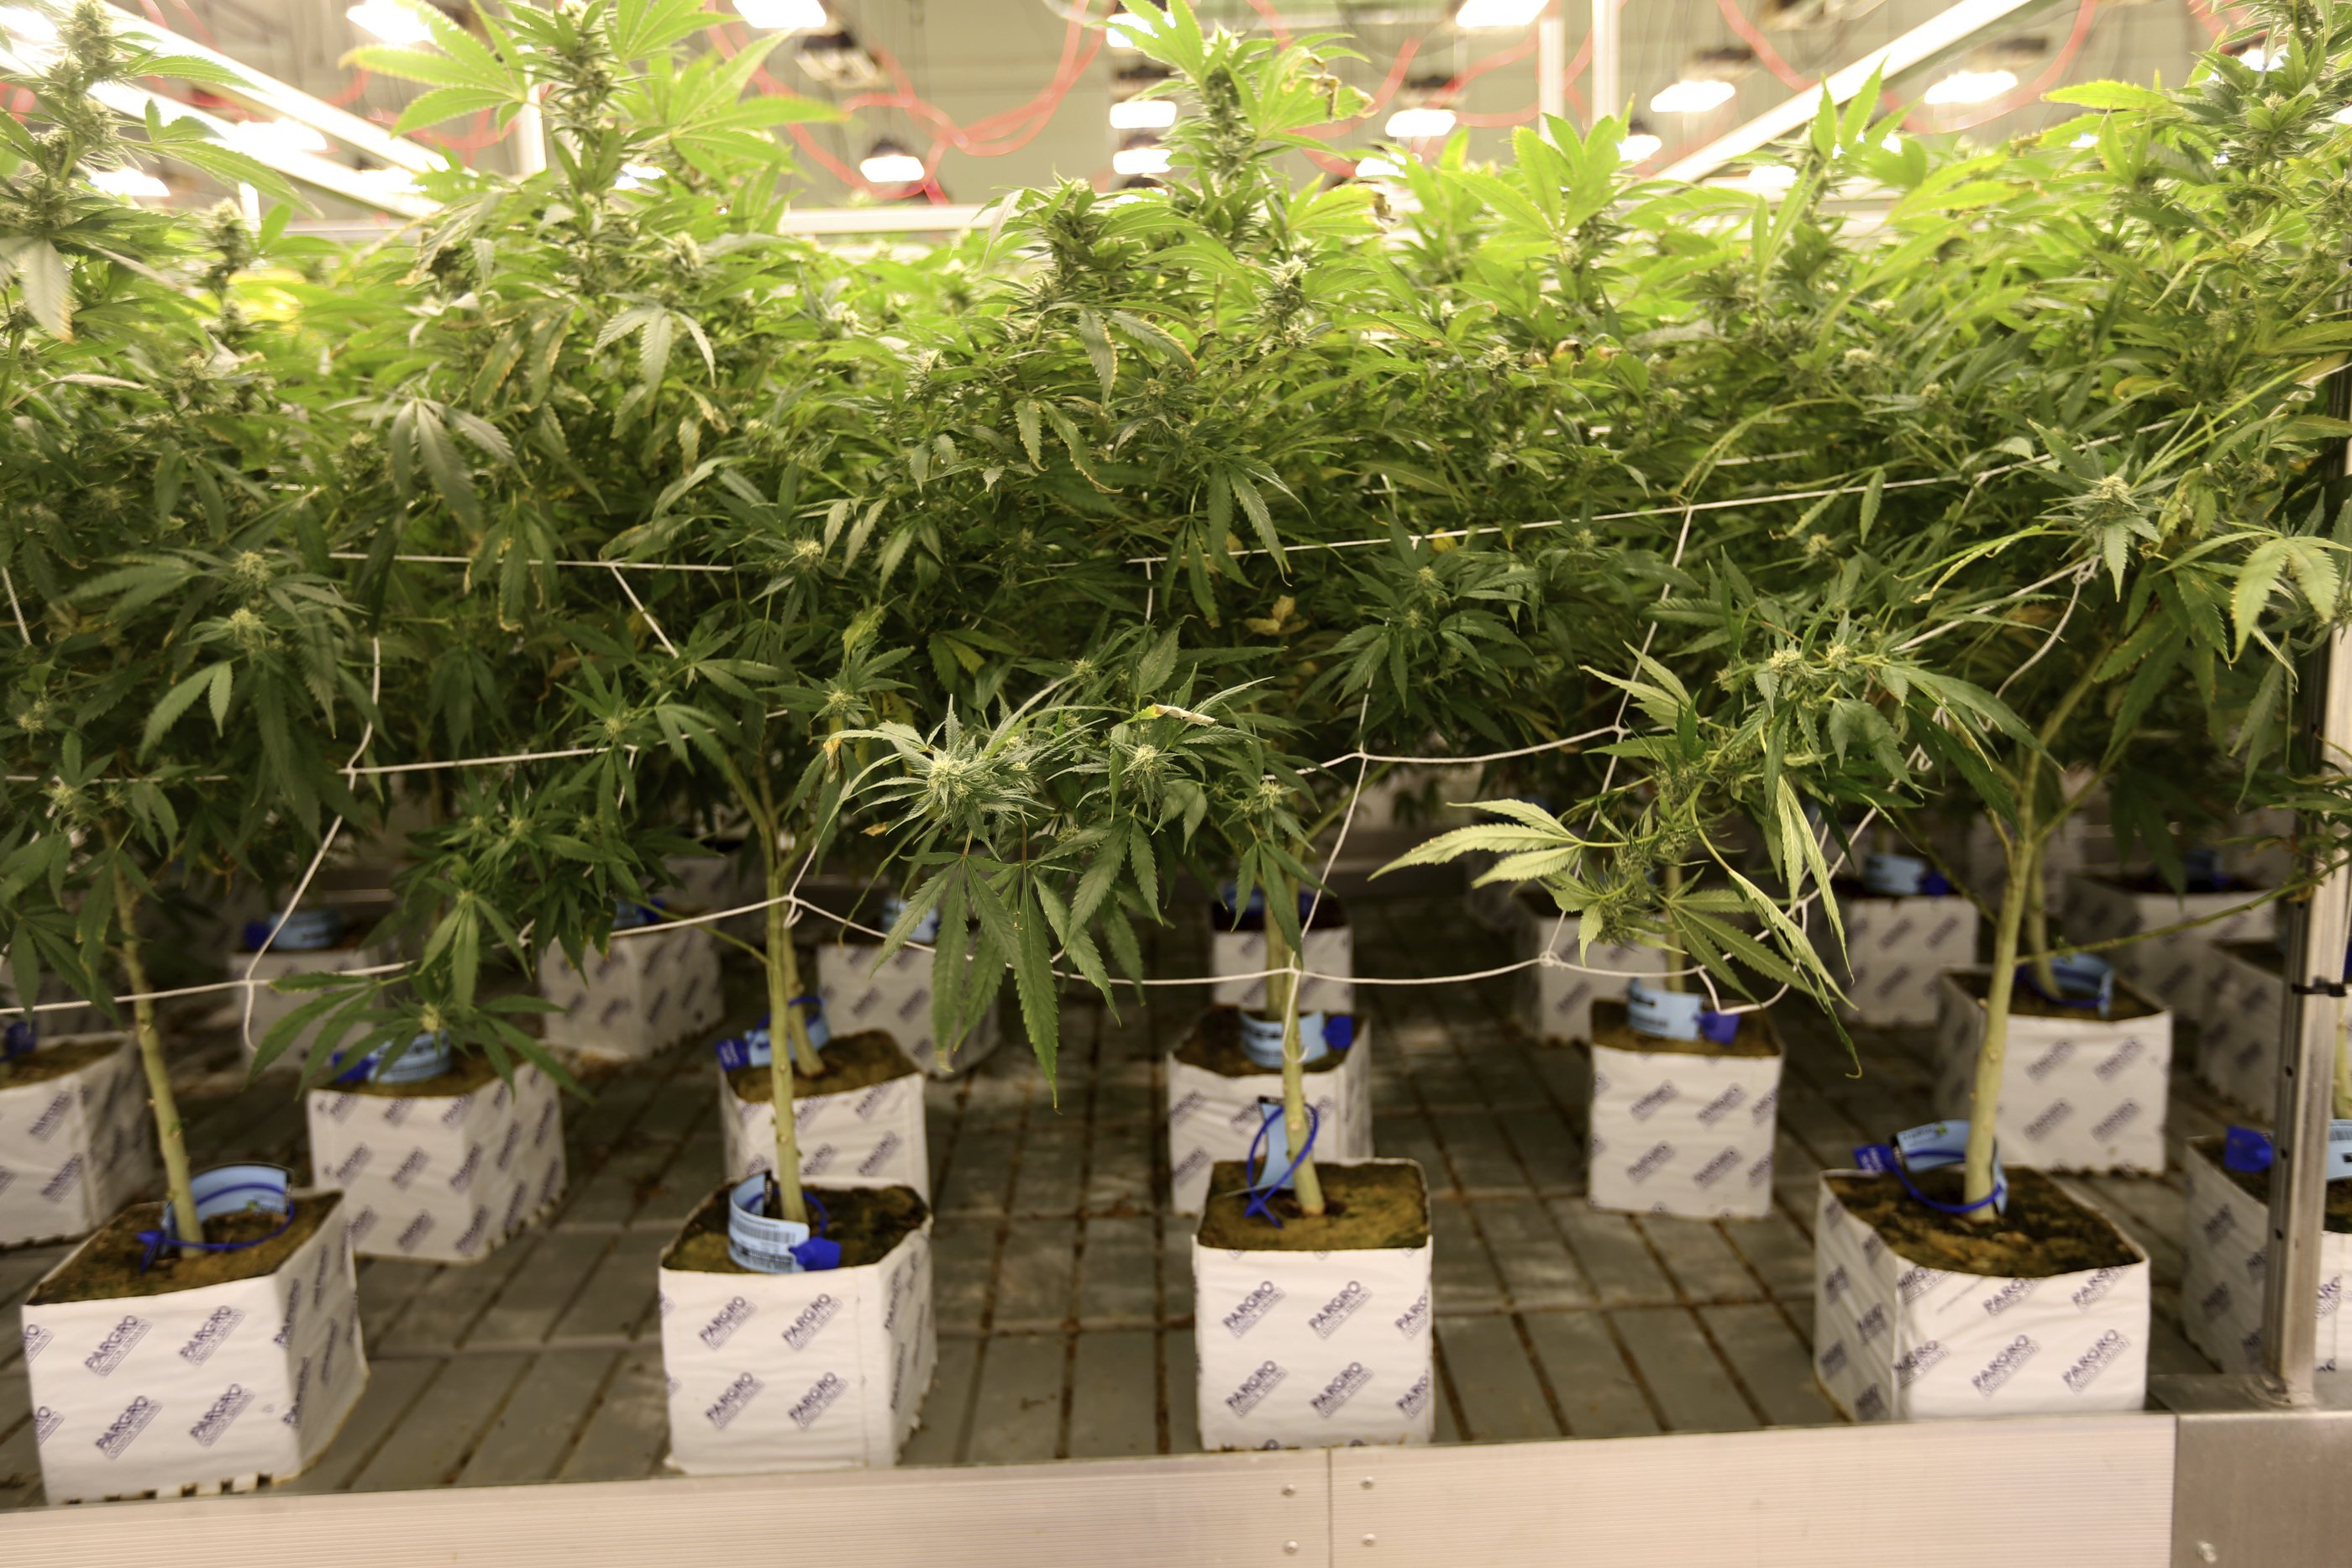 Rural Nevada not embracing legalized recreational marijuana